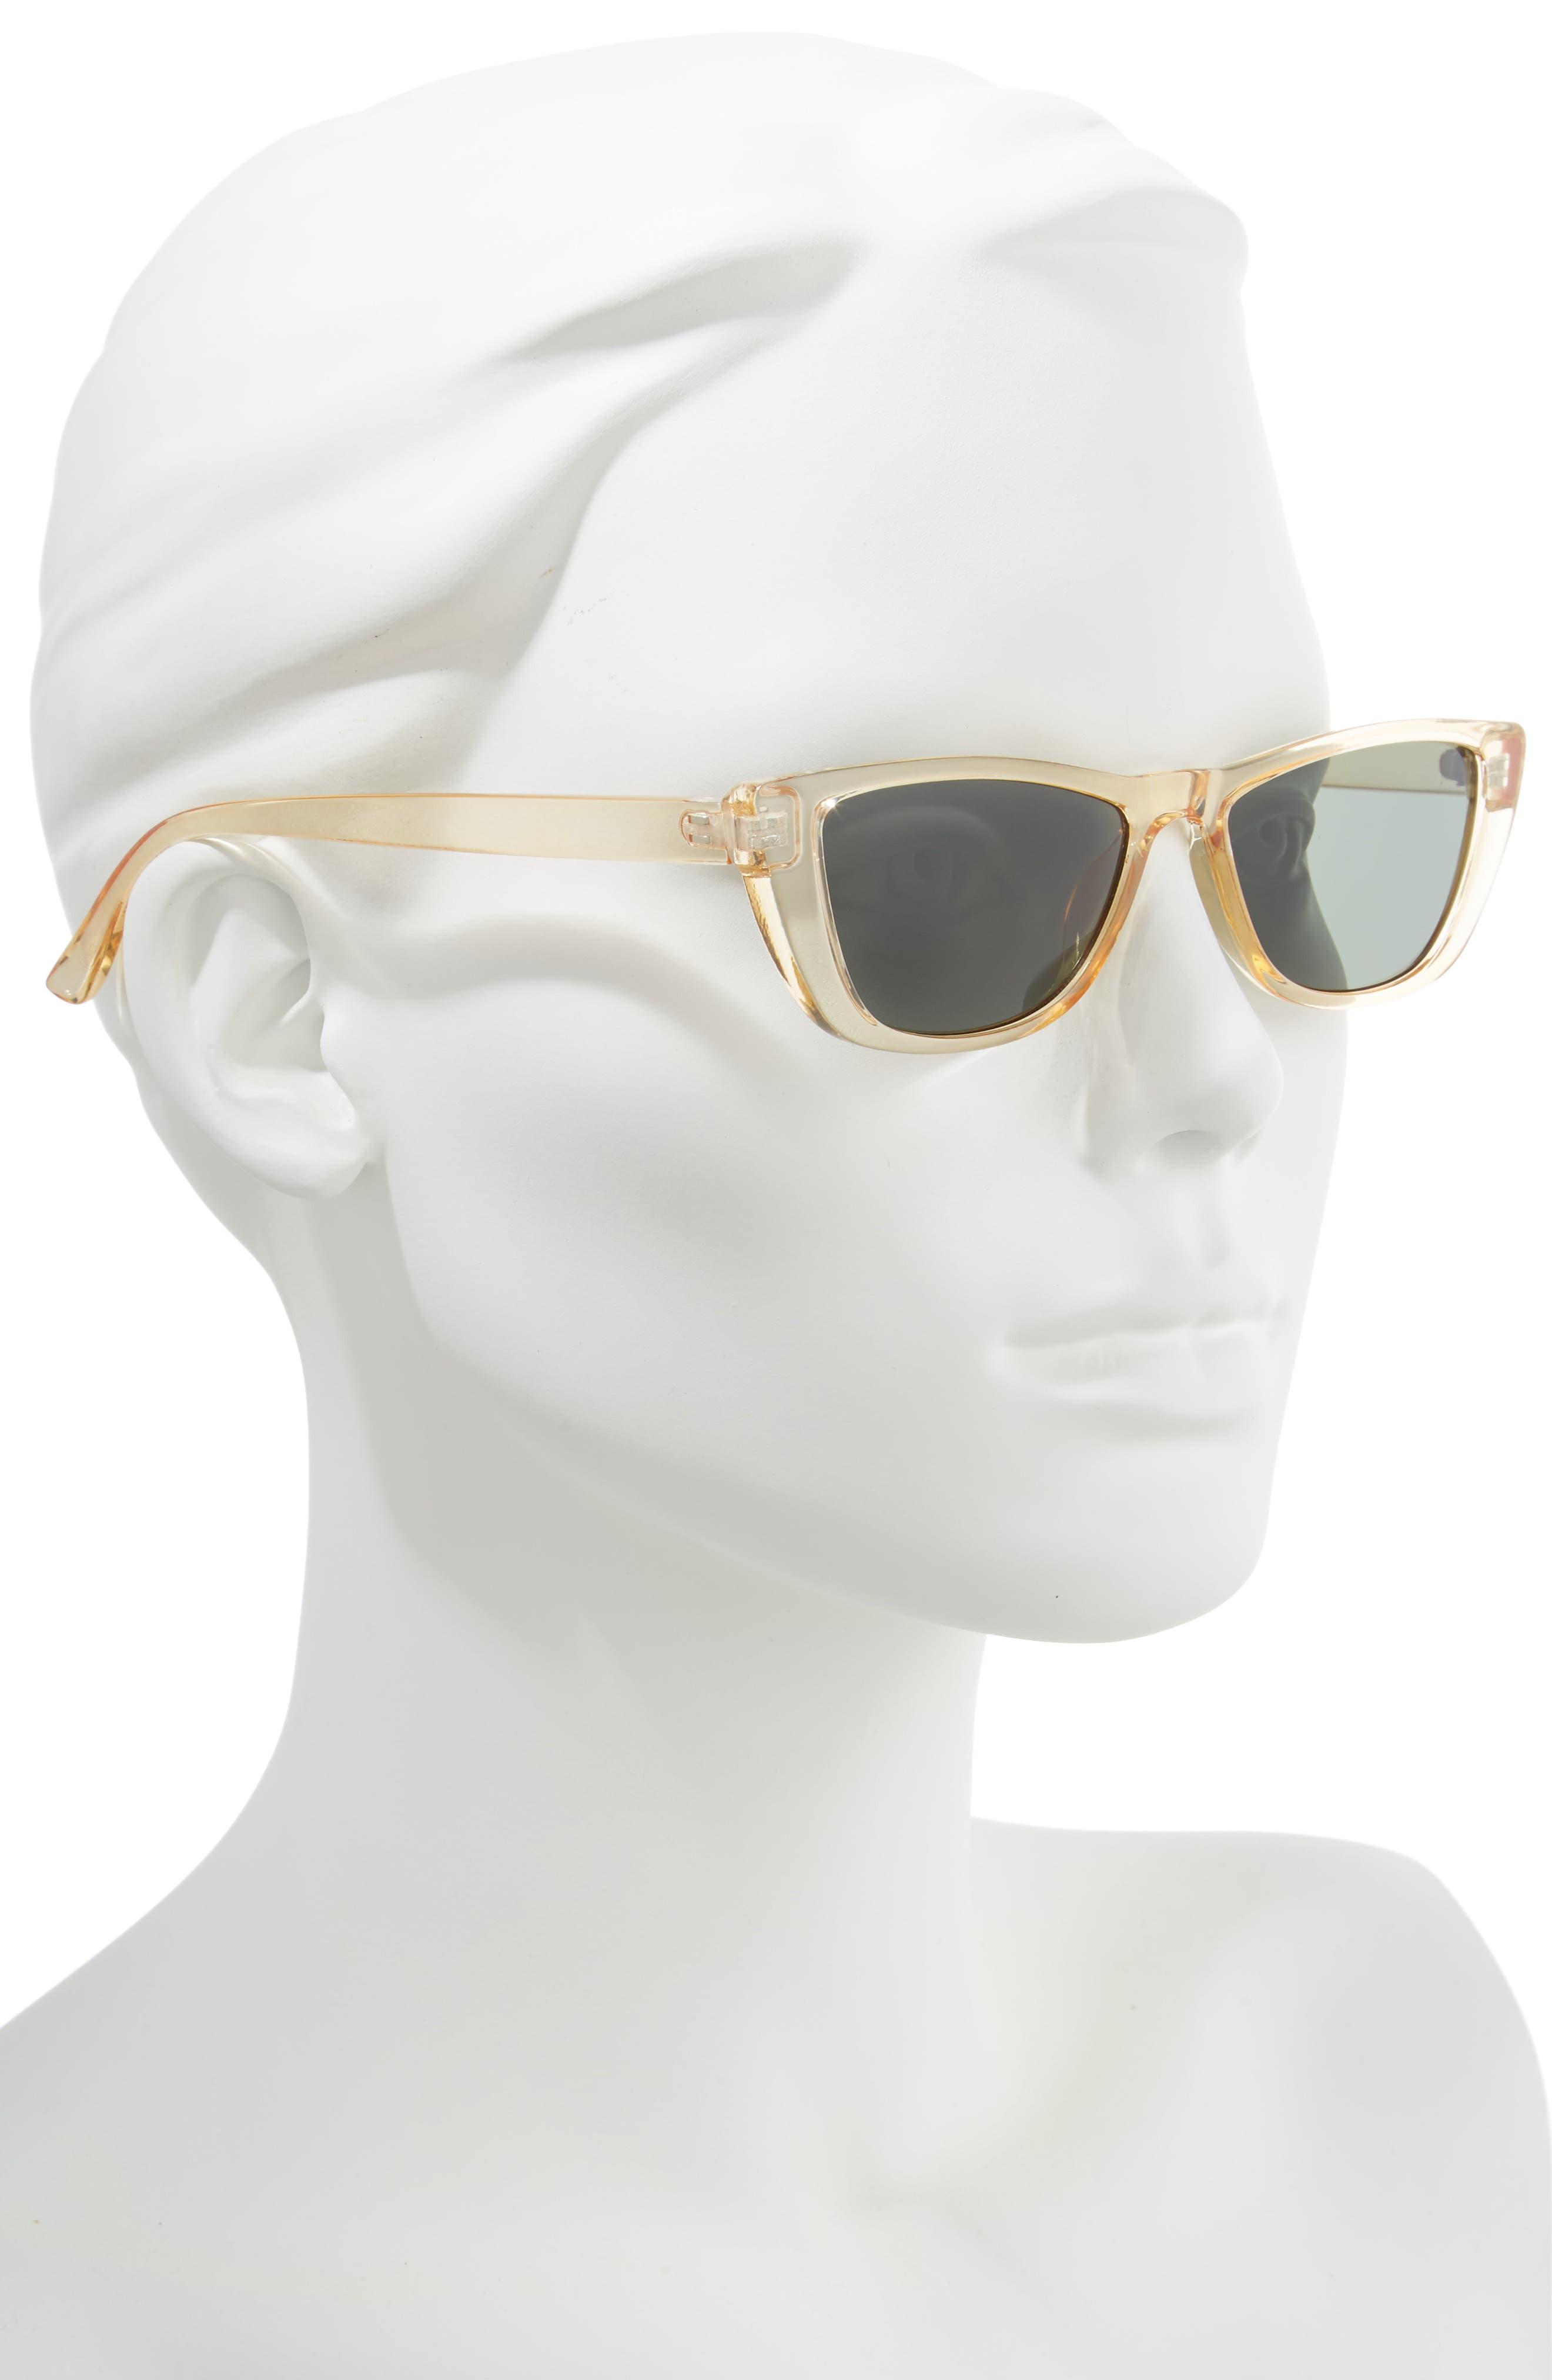 49mm Flat Top Rectangular Sunglasses,                             Alternate thumbnail 2, color,                             700